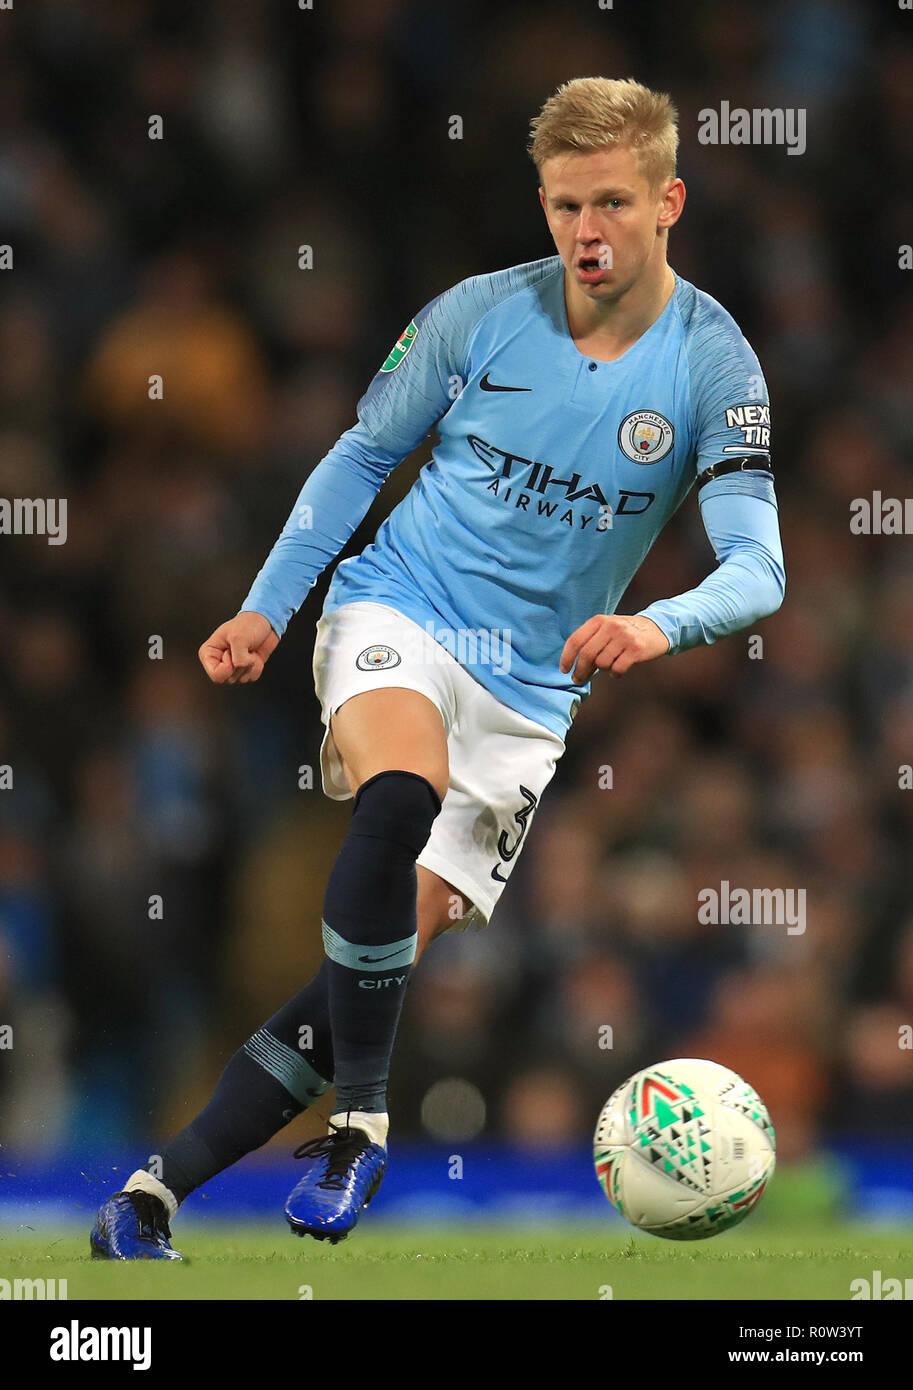 Manchester City's Alexander Zinchenko Stock Photo - Alamy